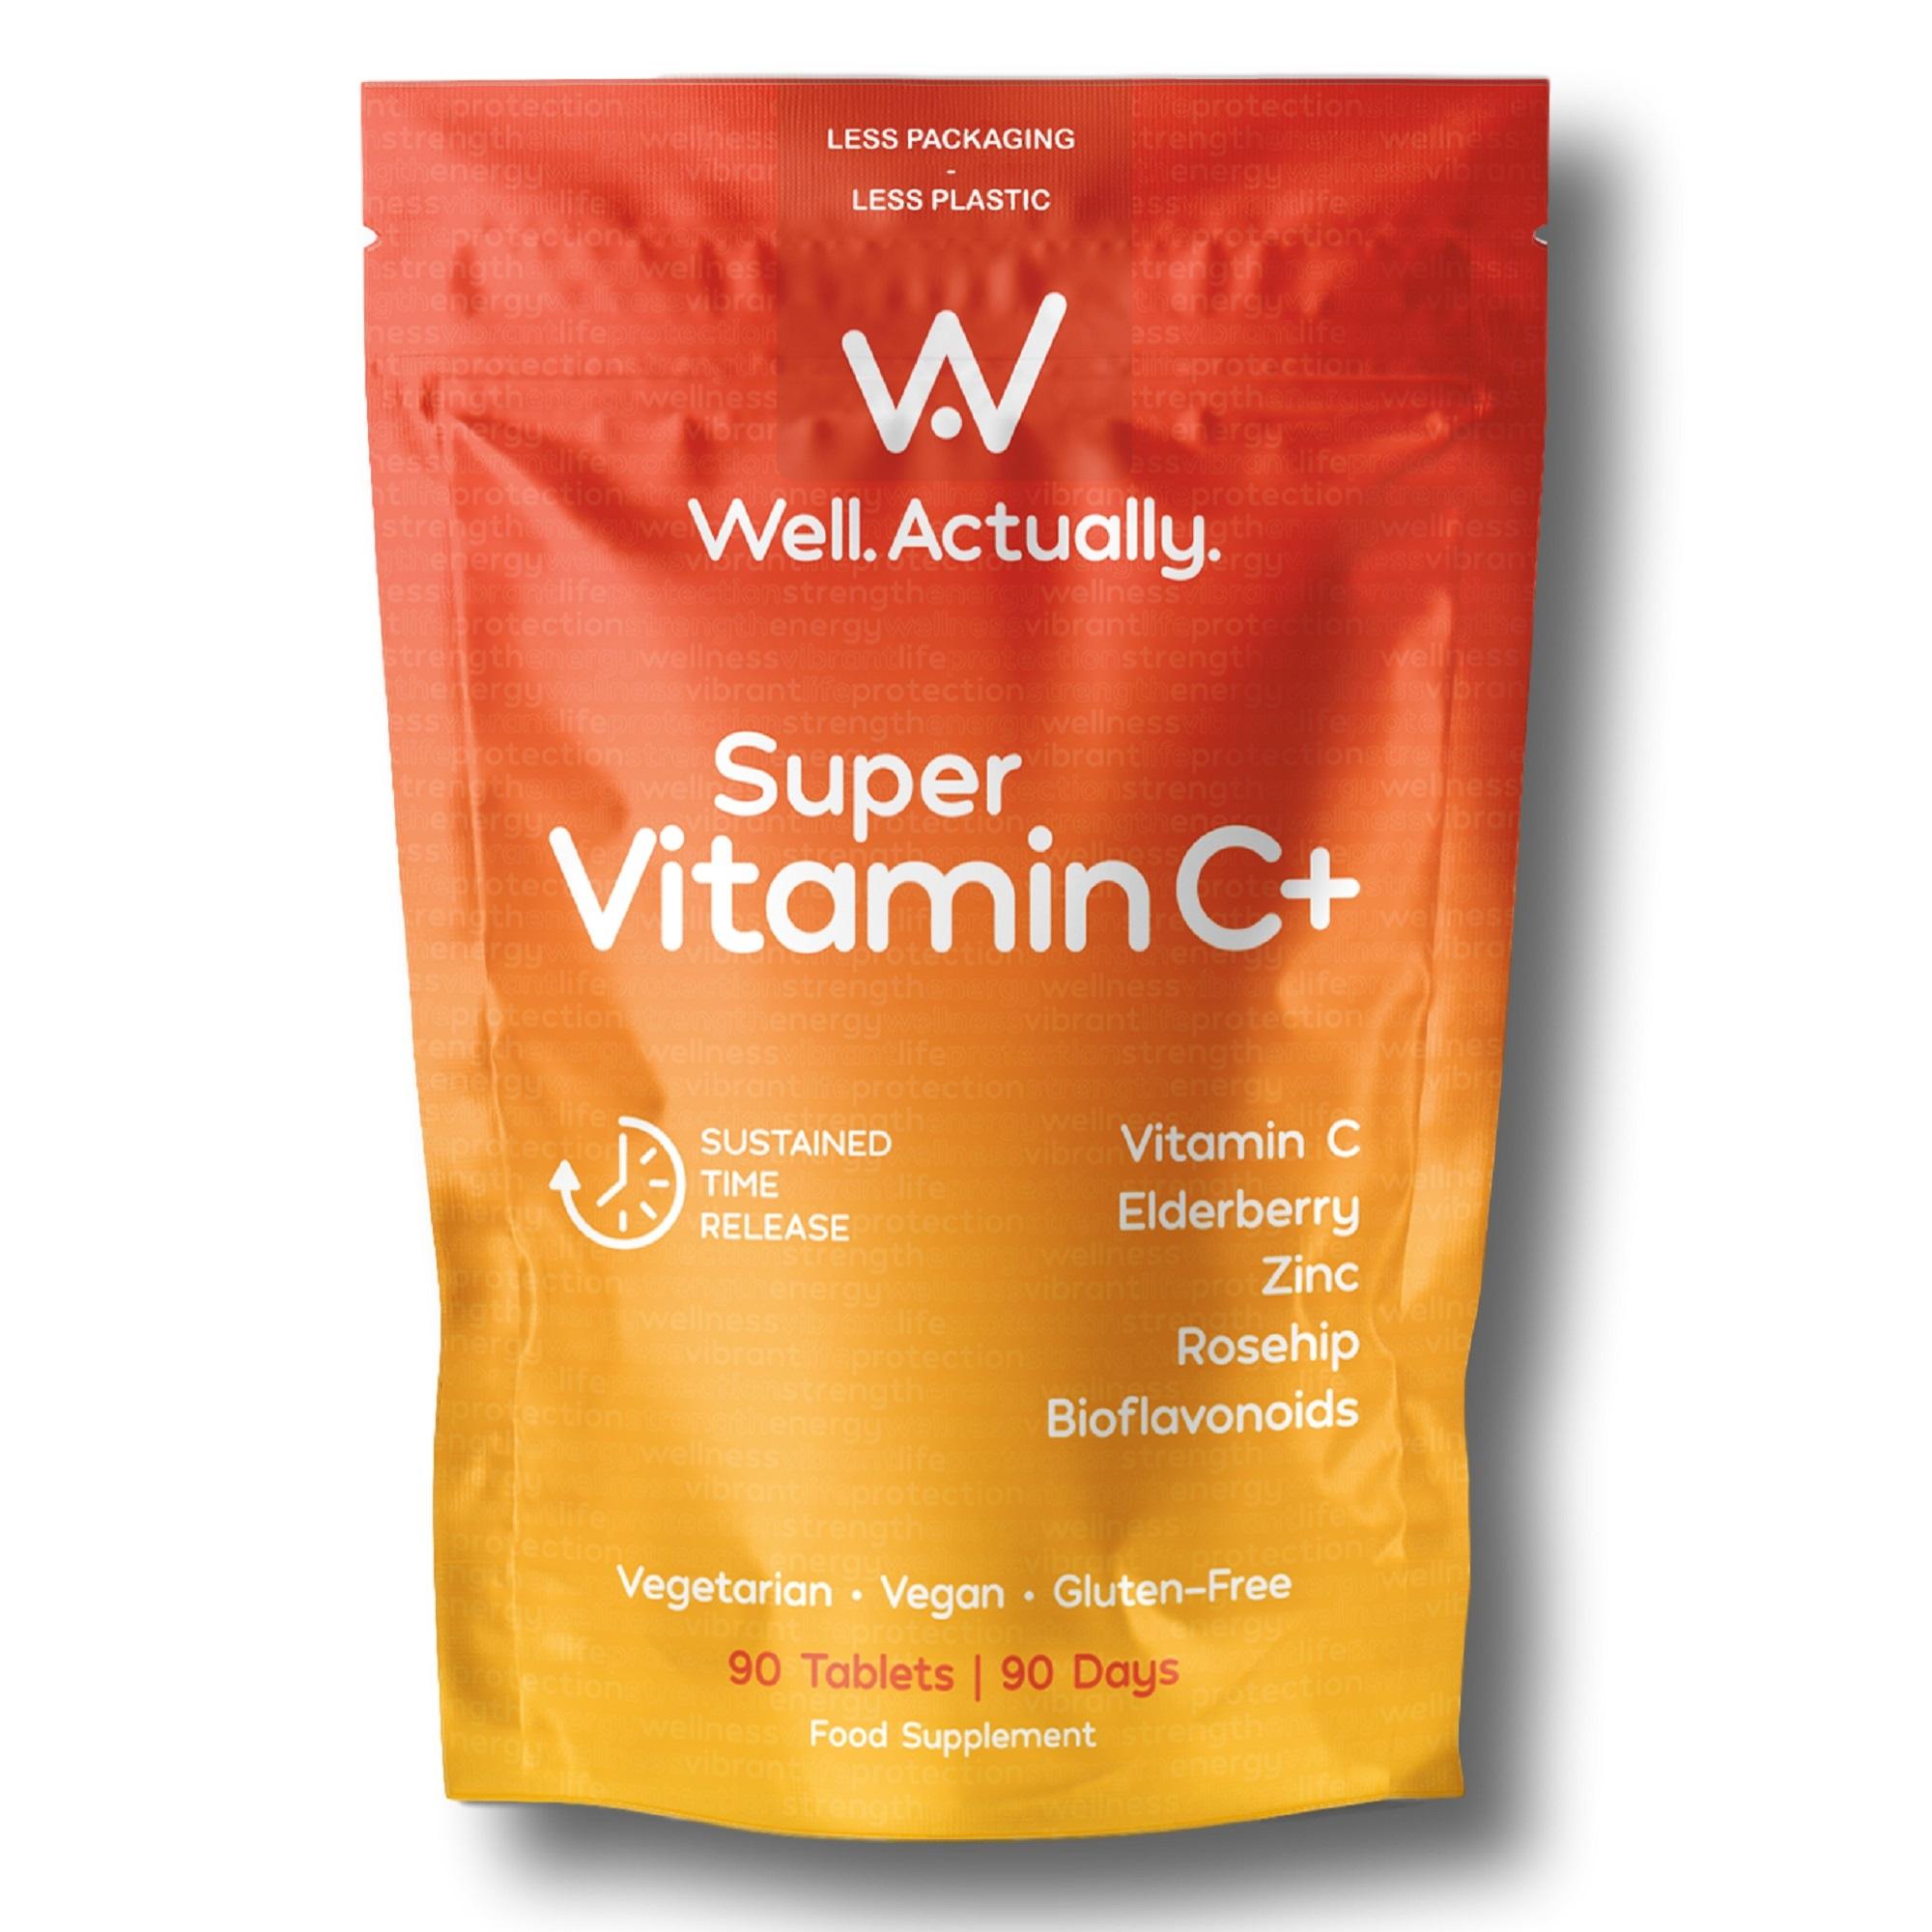 Super Vitamin C+ 90's